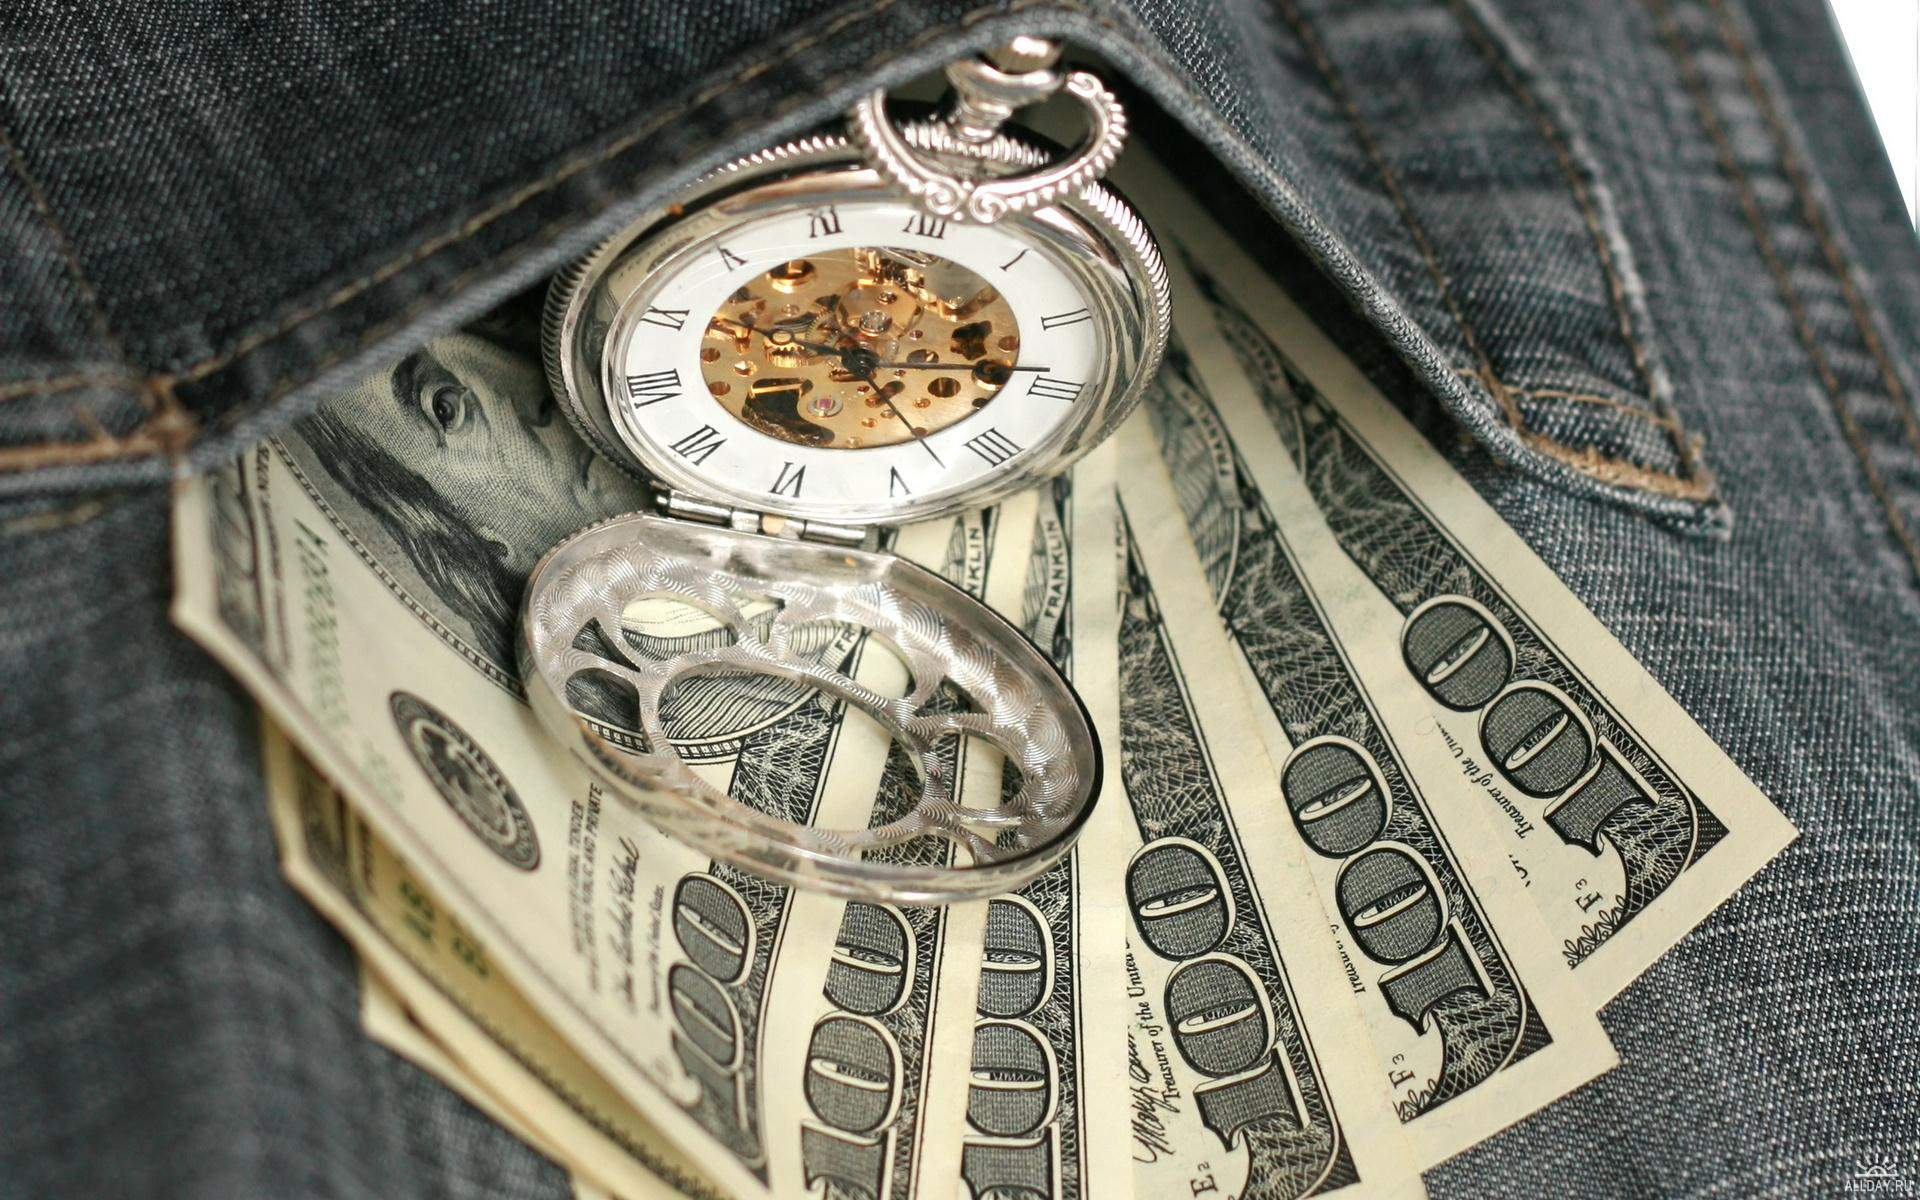 D:\Documents and Settings\User\Рабочий стол\Деньги фото\время - деньги.jpg